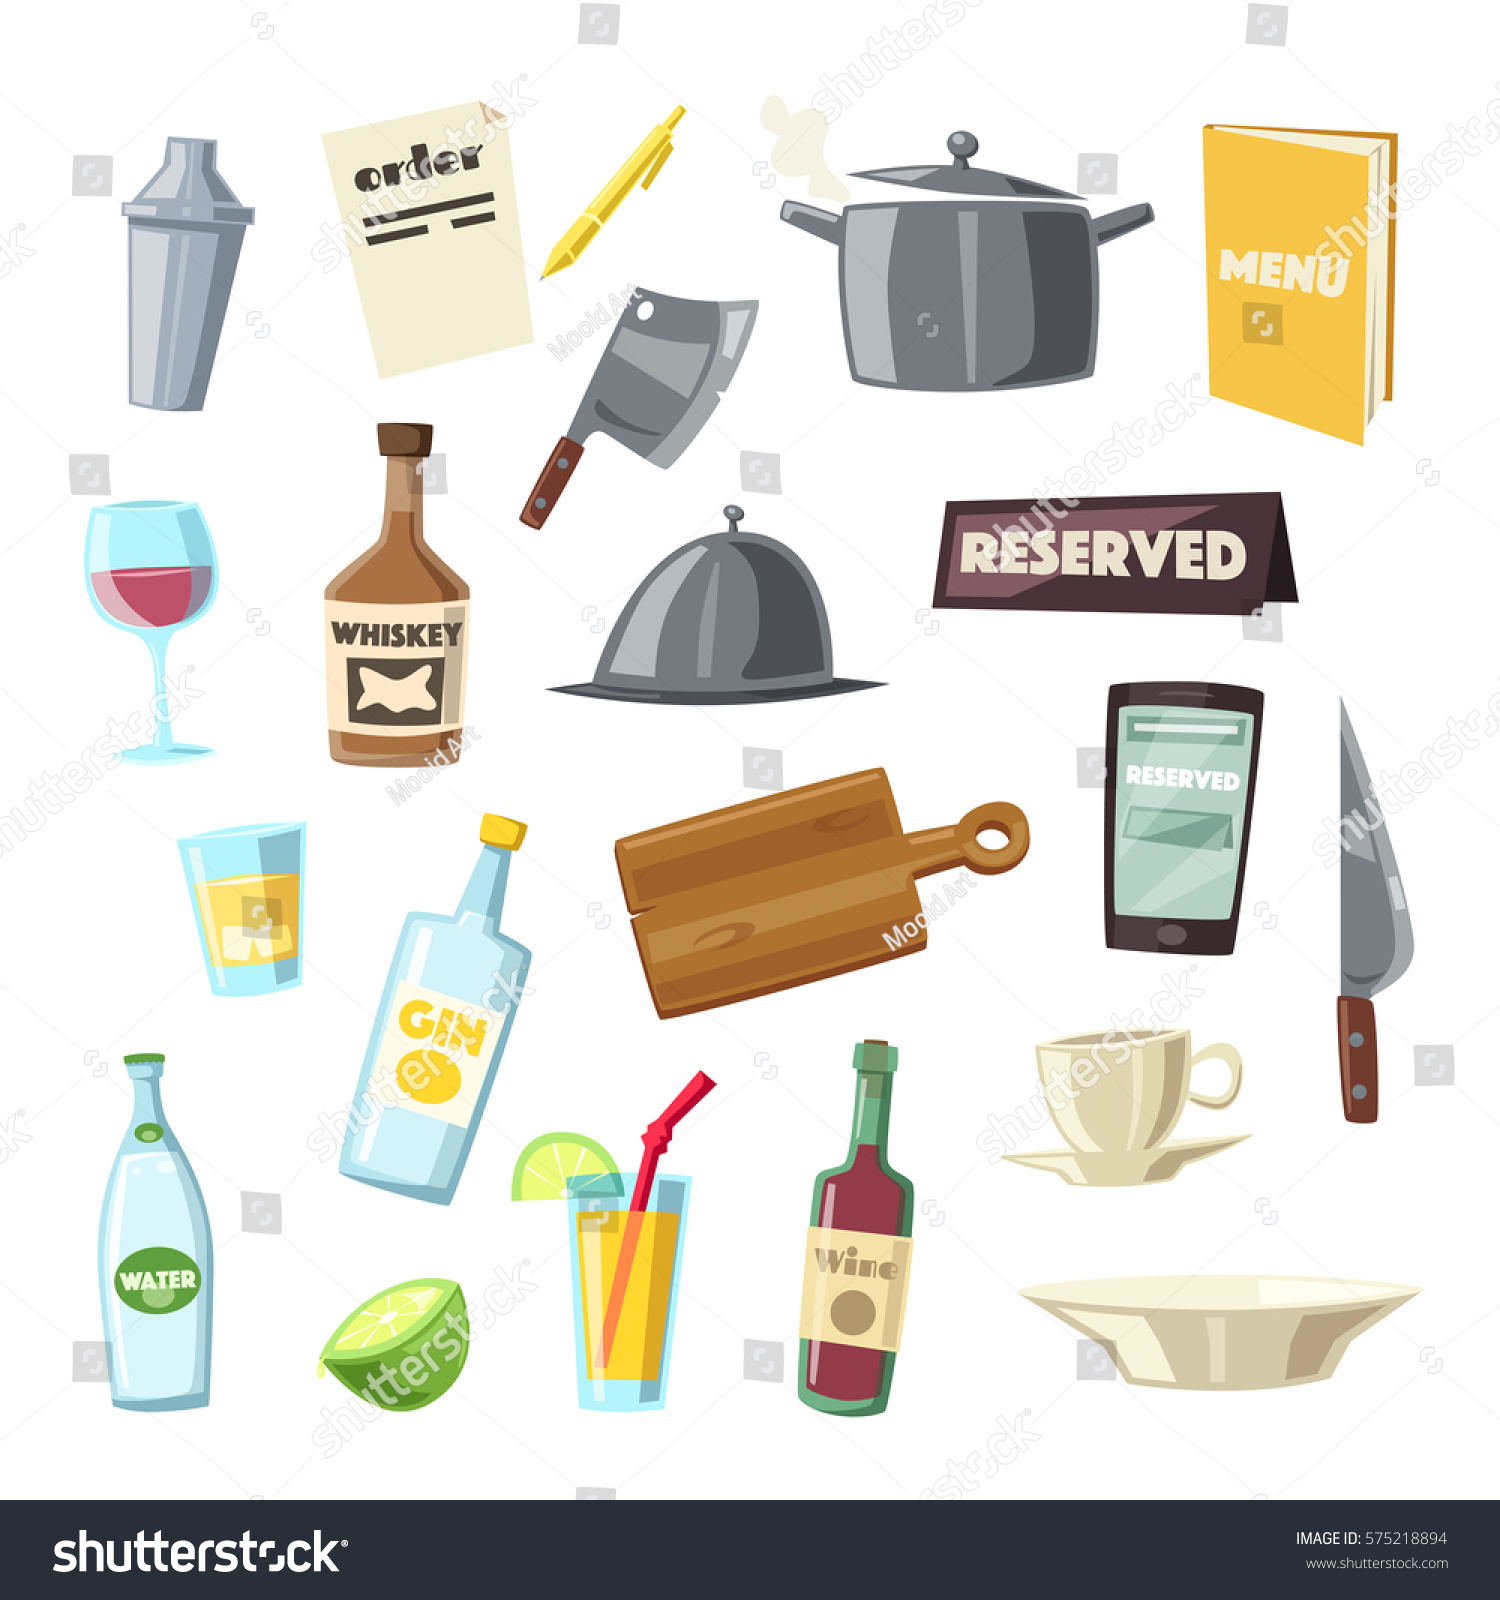 Set kitchen equipment cartoon vector illustration stock for Kitchen set vector